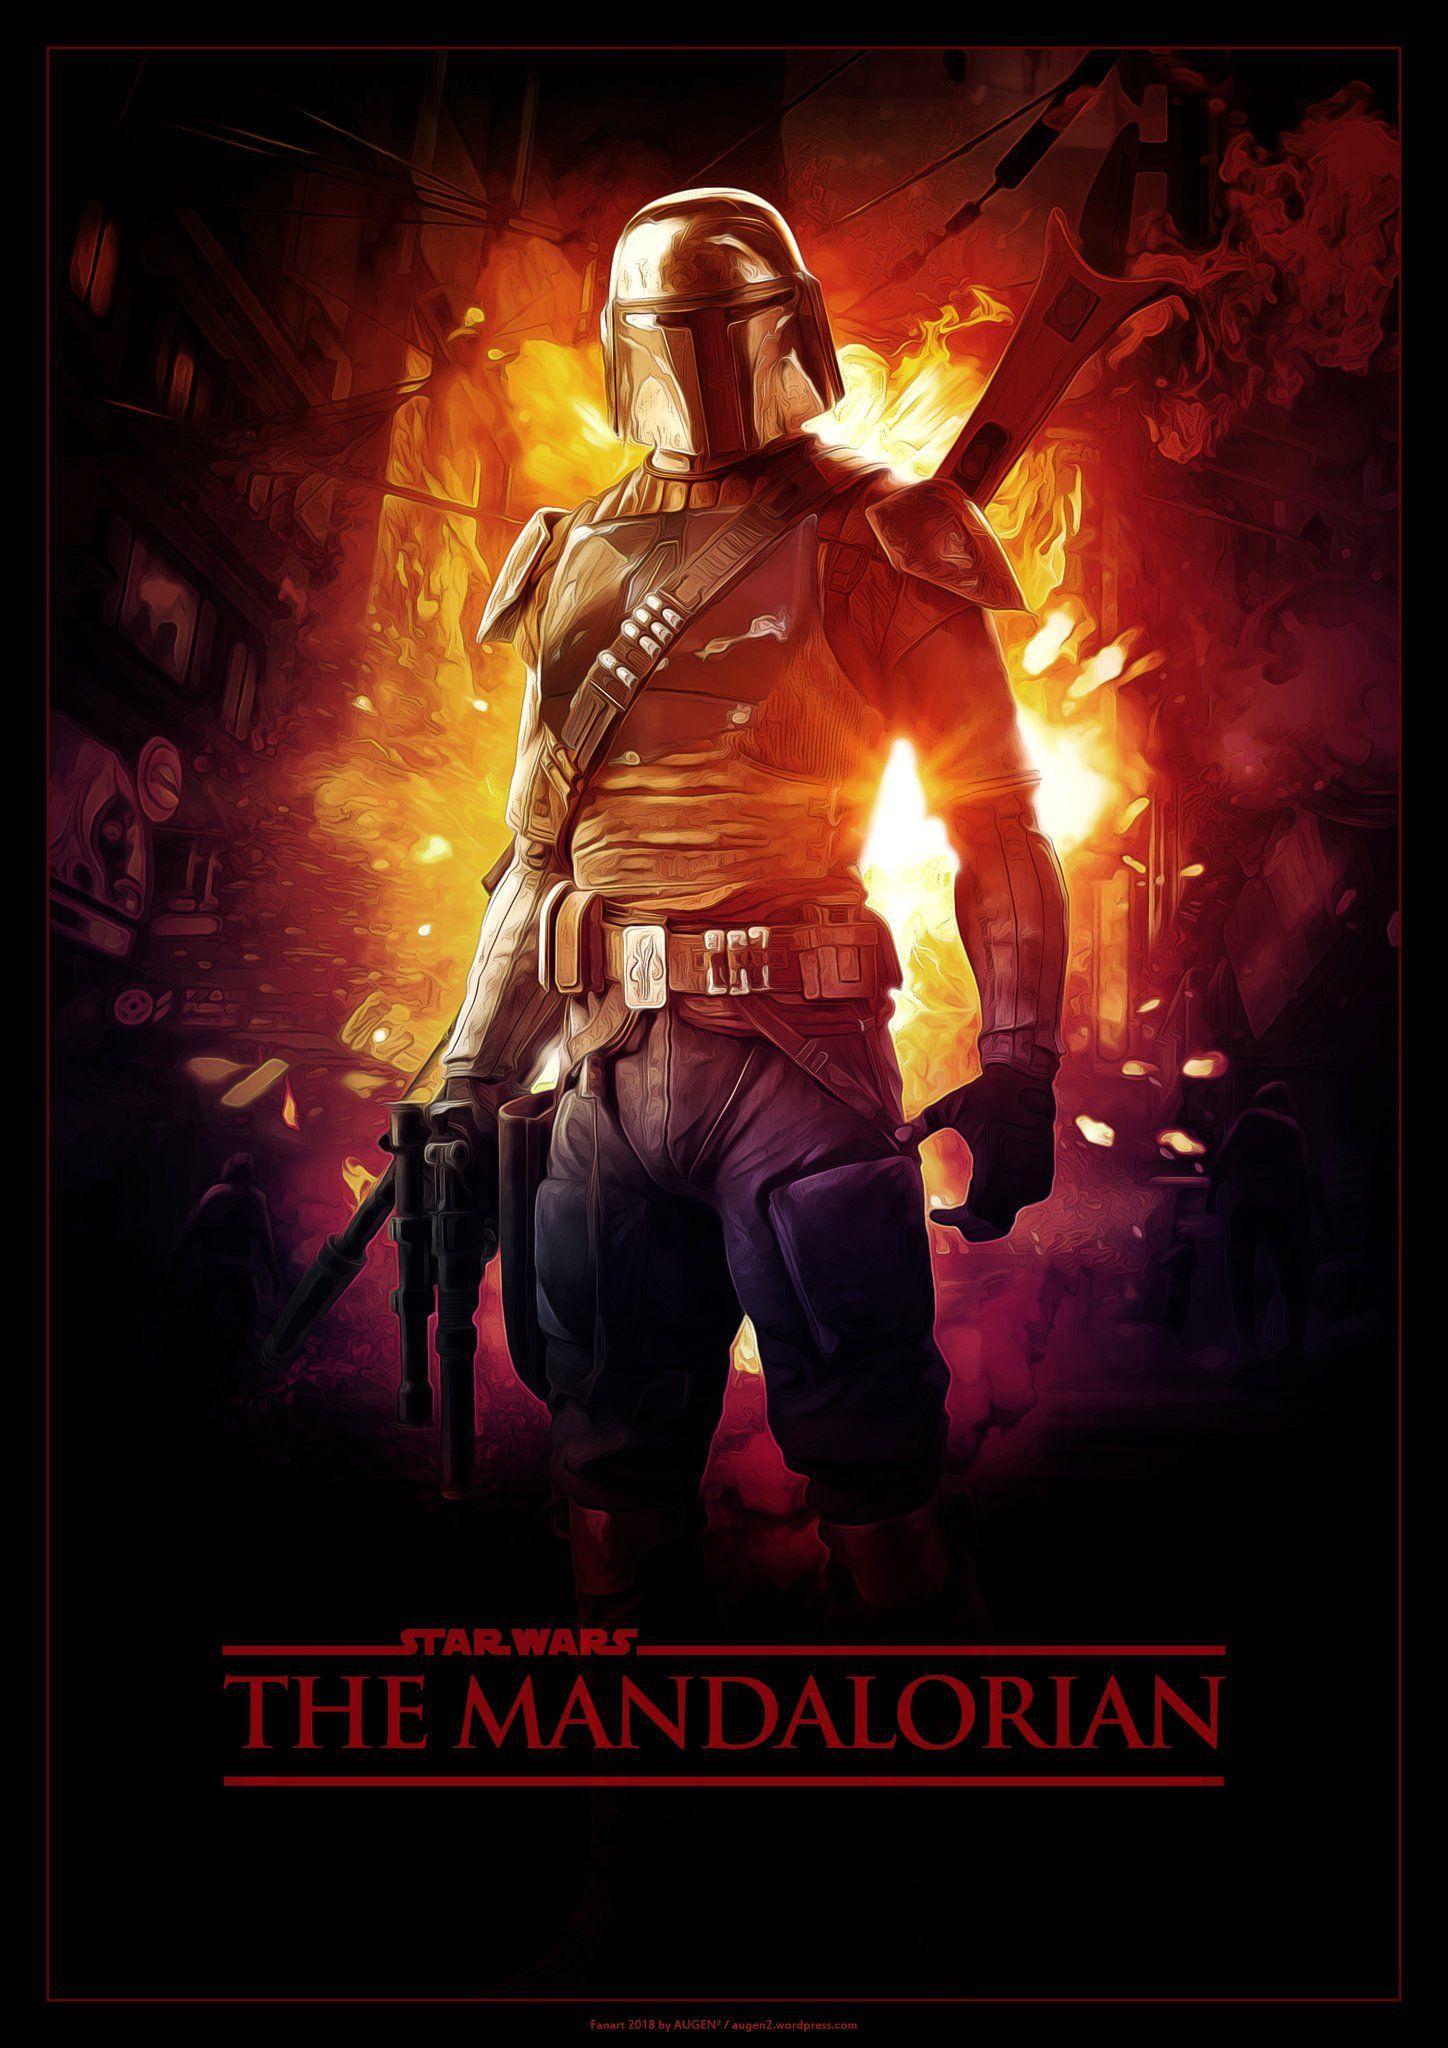 The Mandalorian Season 2 Wallpapers Wallpaper Cave